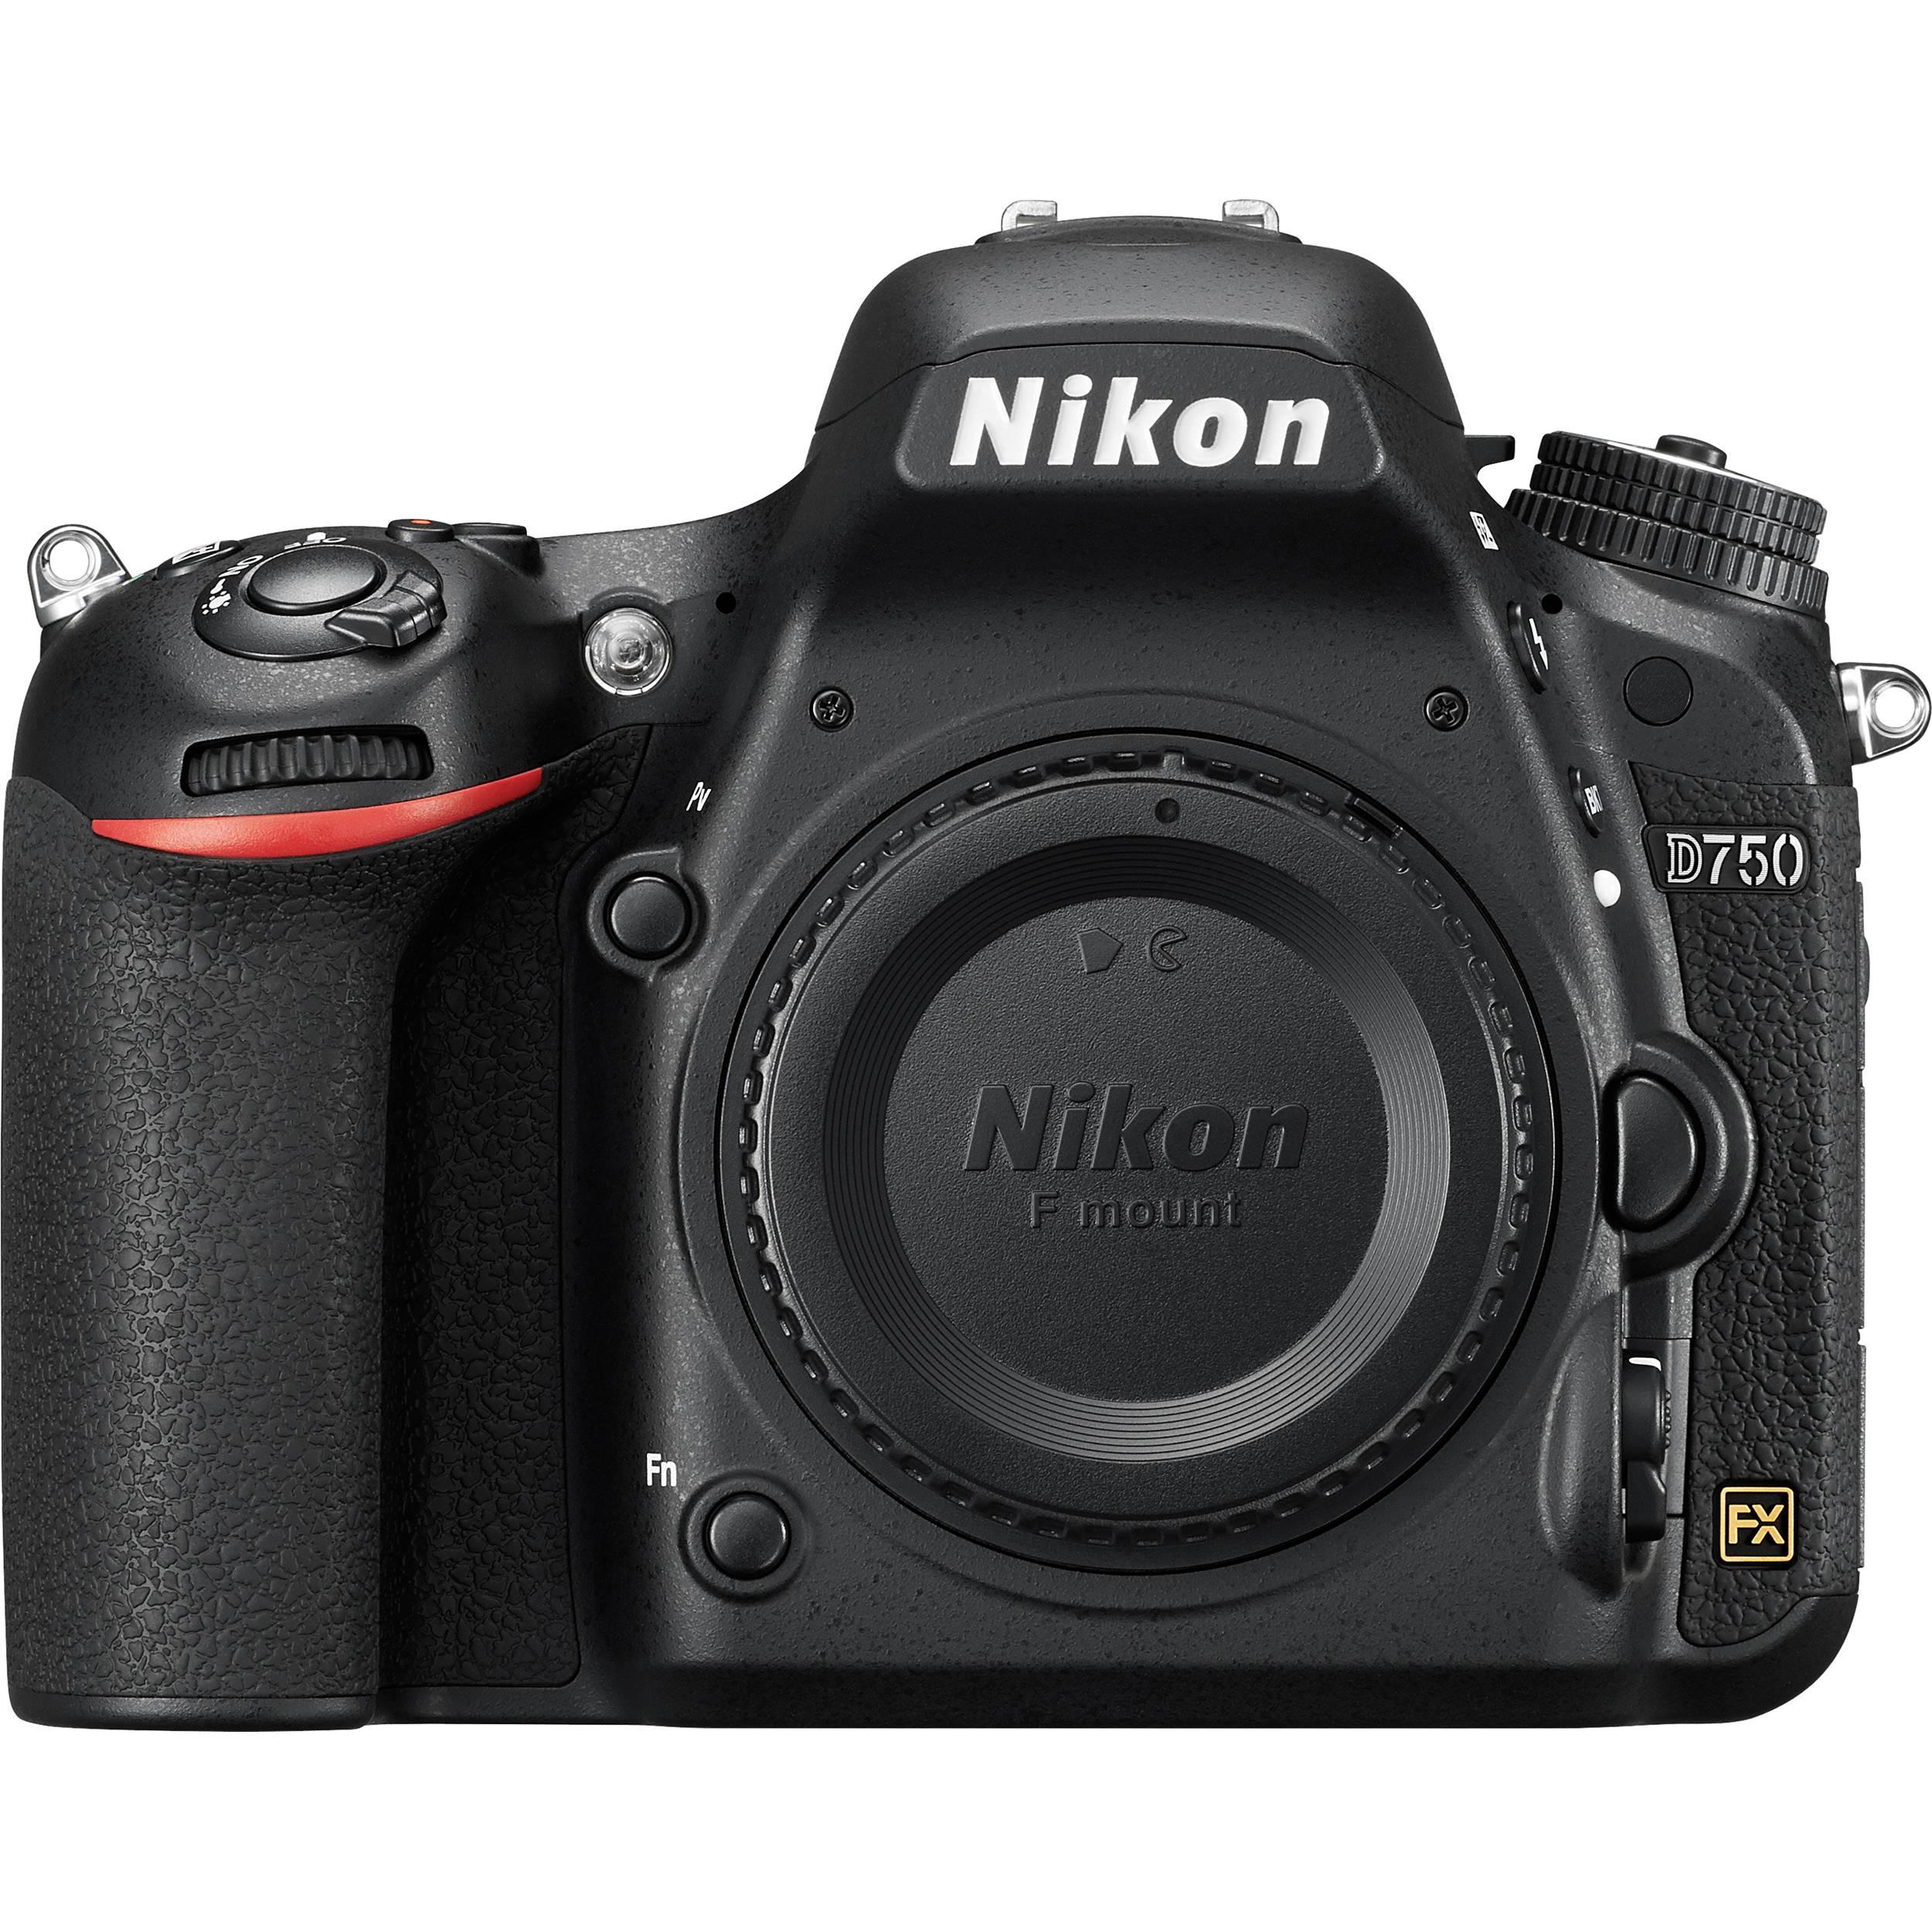 Camera Dslr Camera For Video Recording dslr cameras digital slr bh photo nikon d750 camera body only refurbished